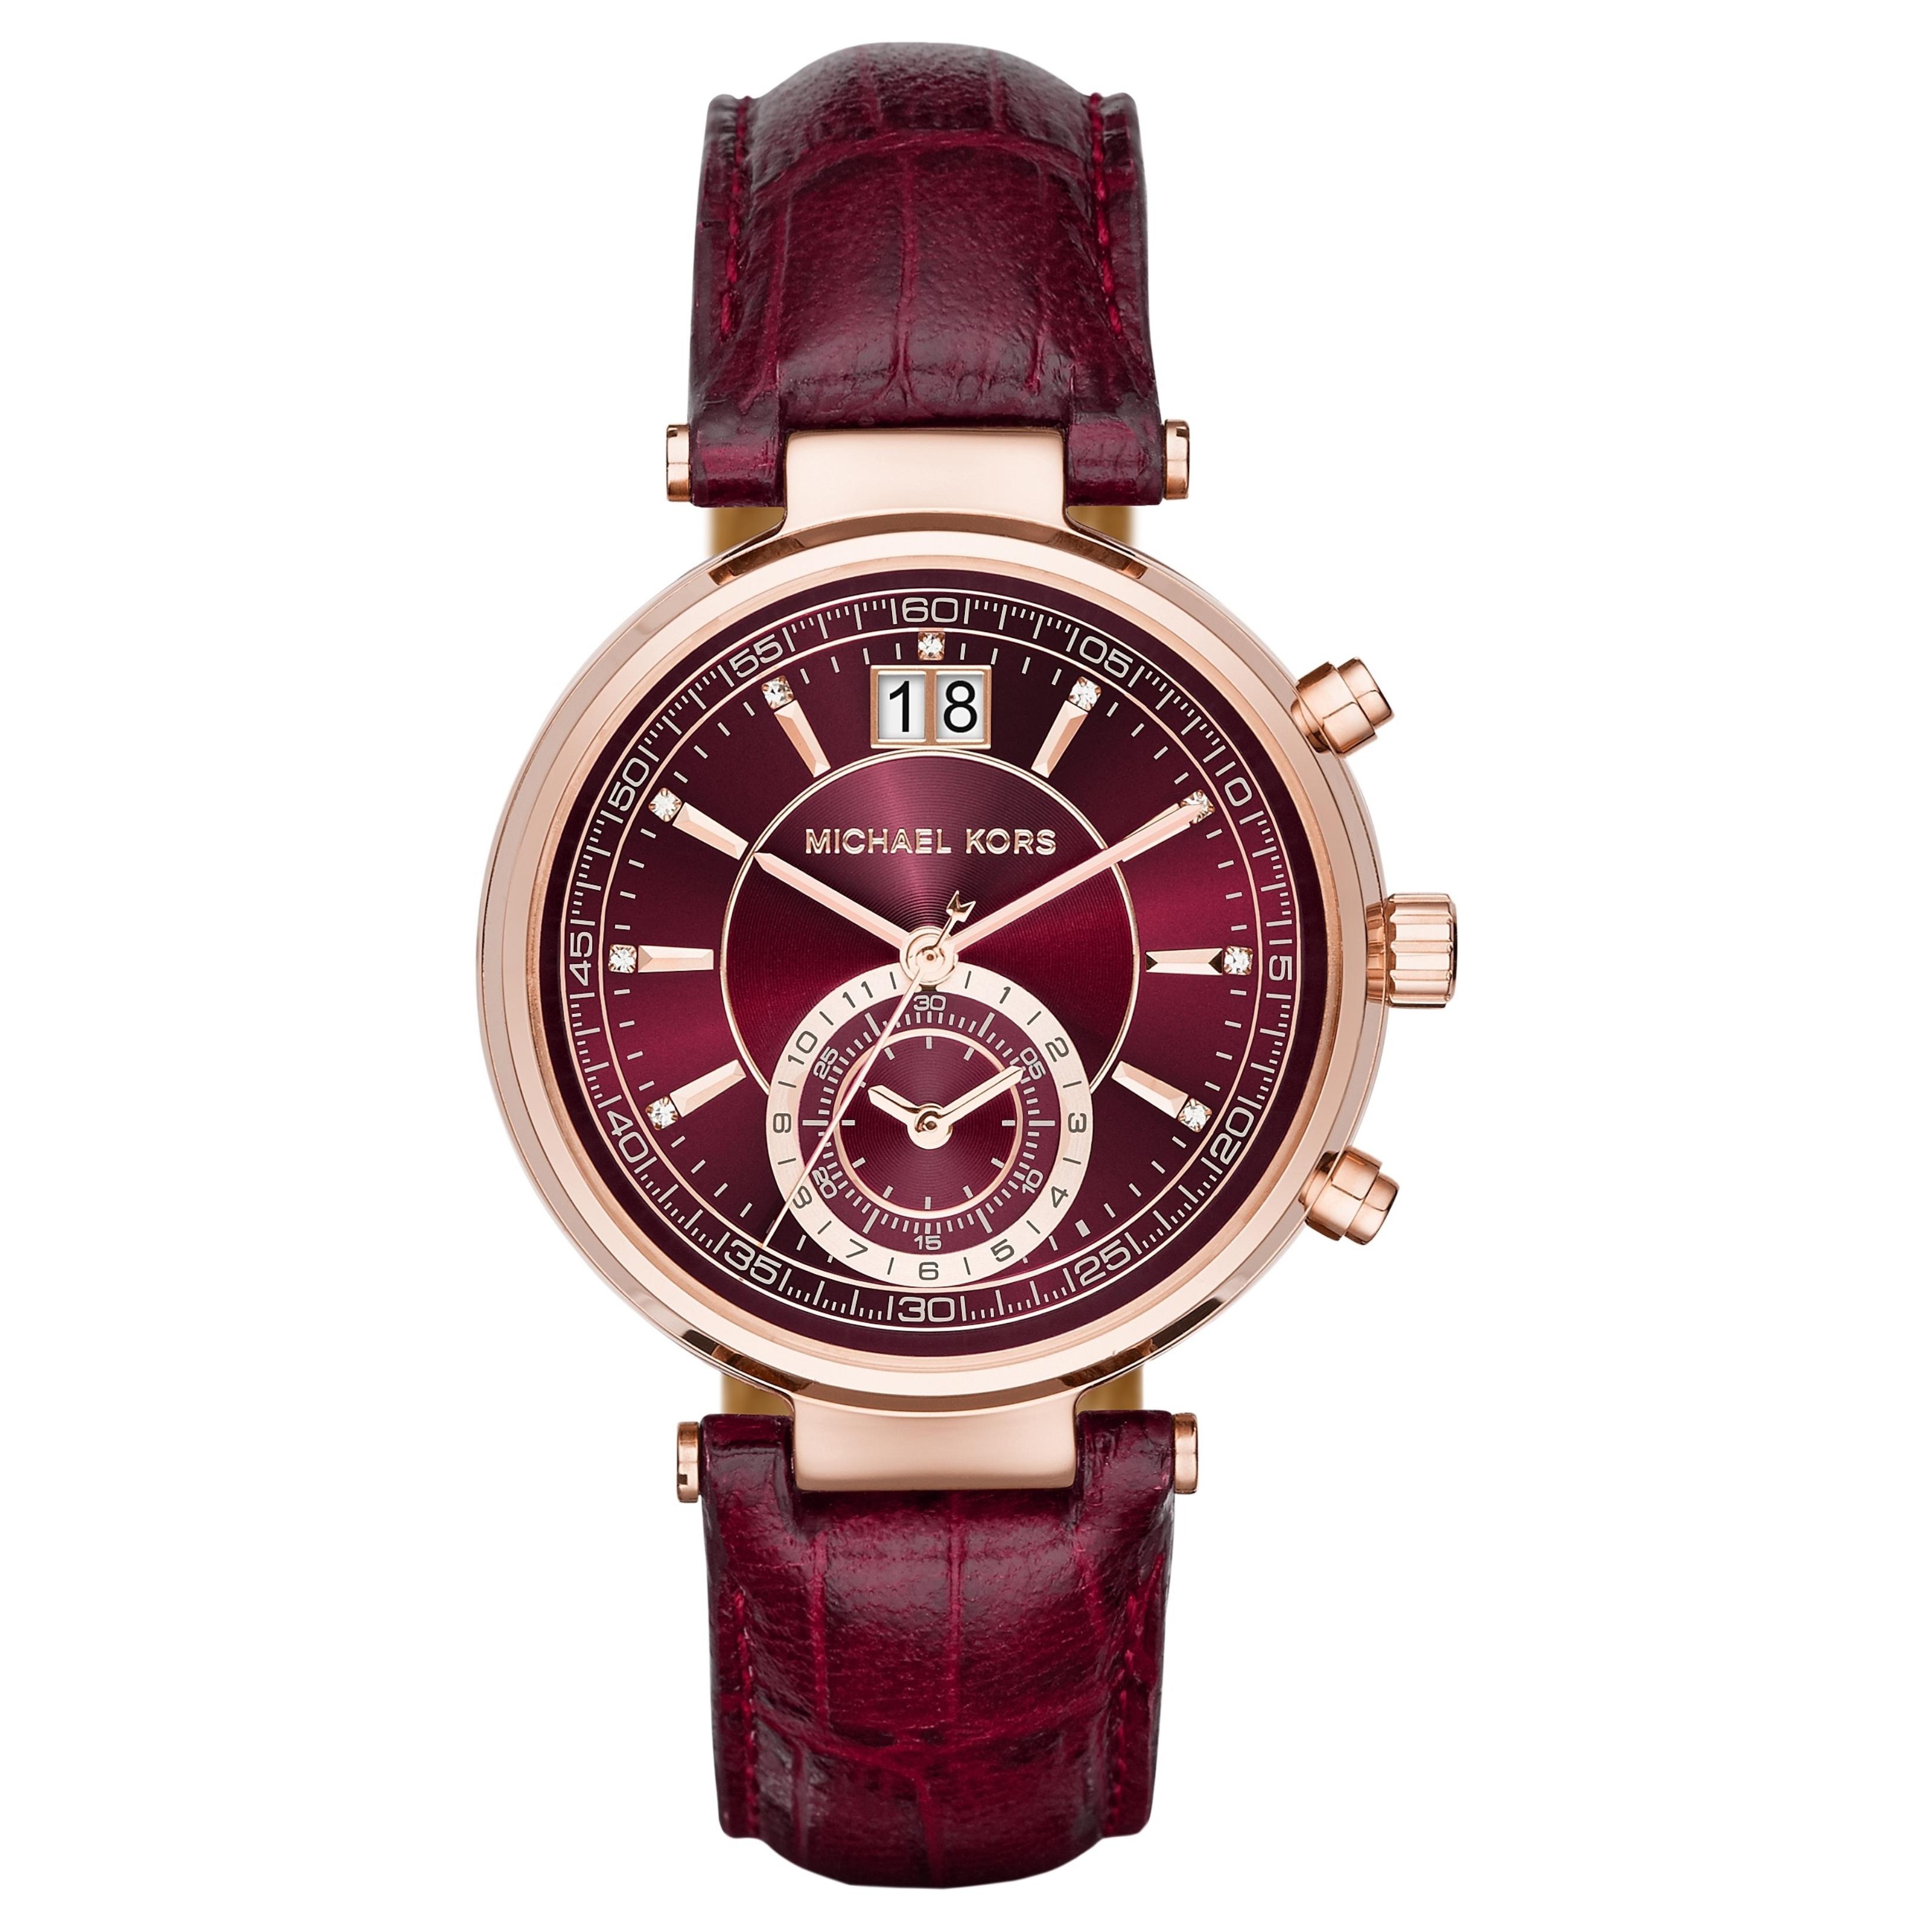 Michael Kors Sawyer Ladies Watch | Chrono Burgundy Dial | Merlot Leather Strap | MK2426